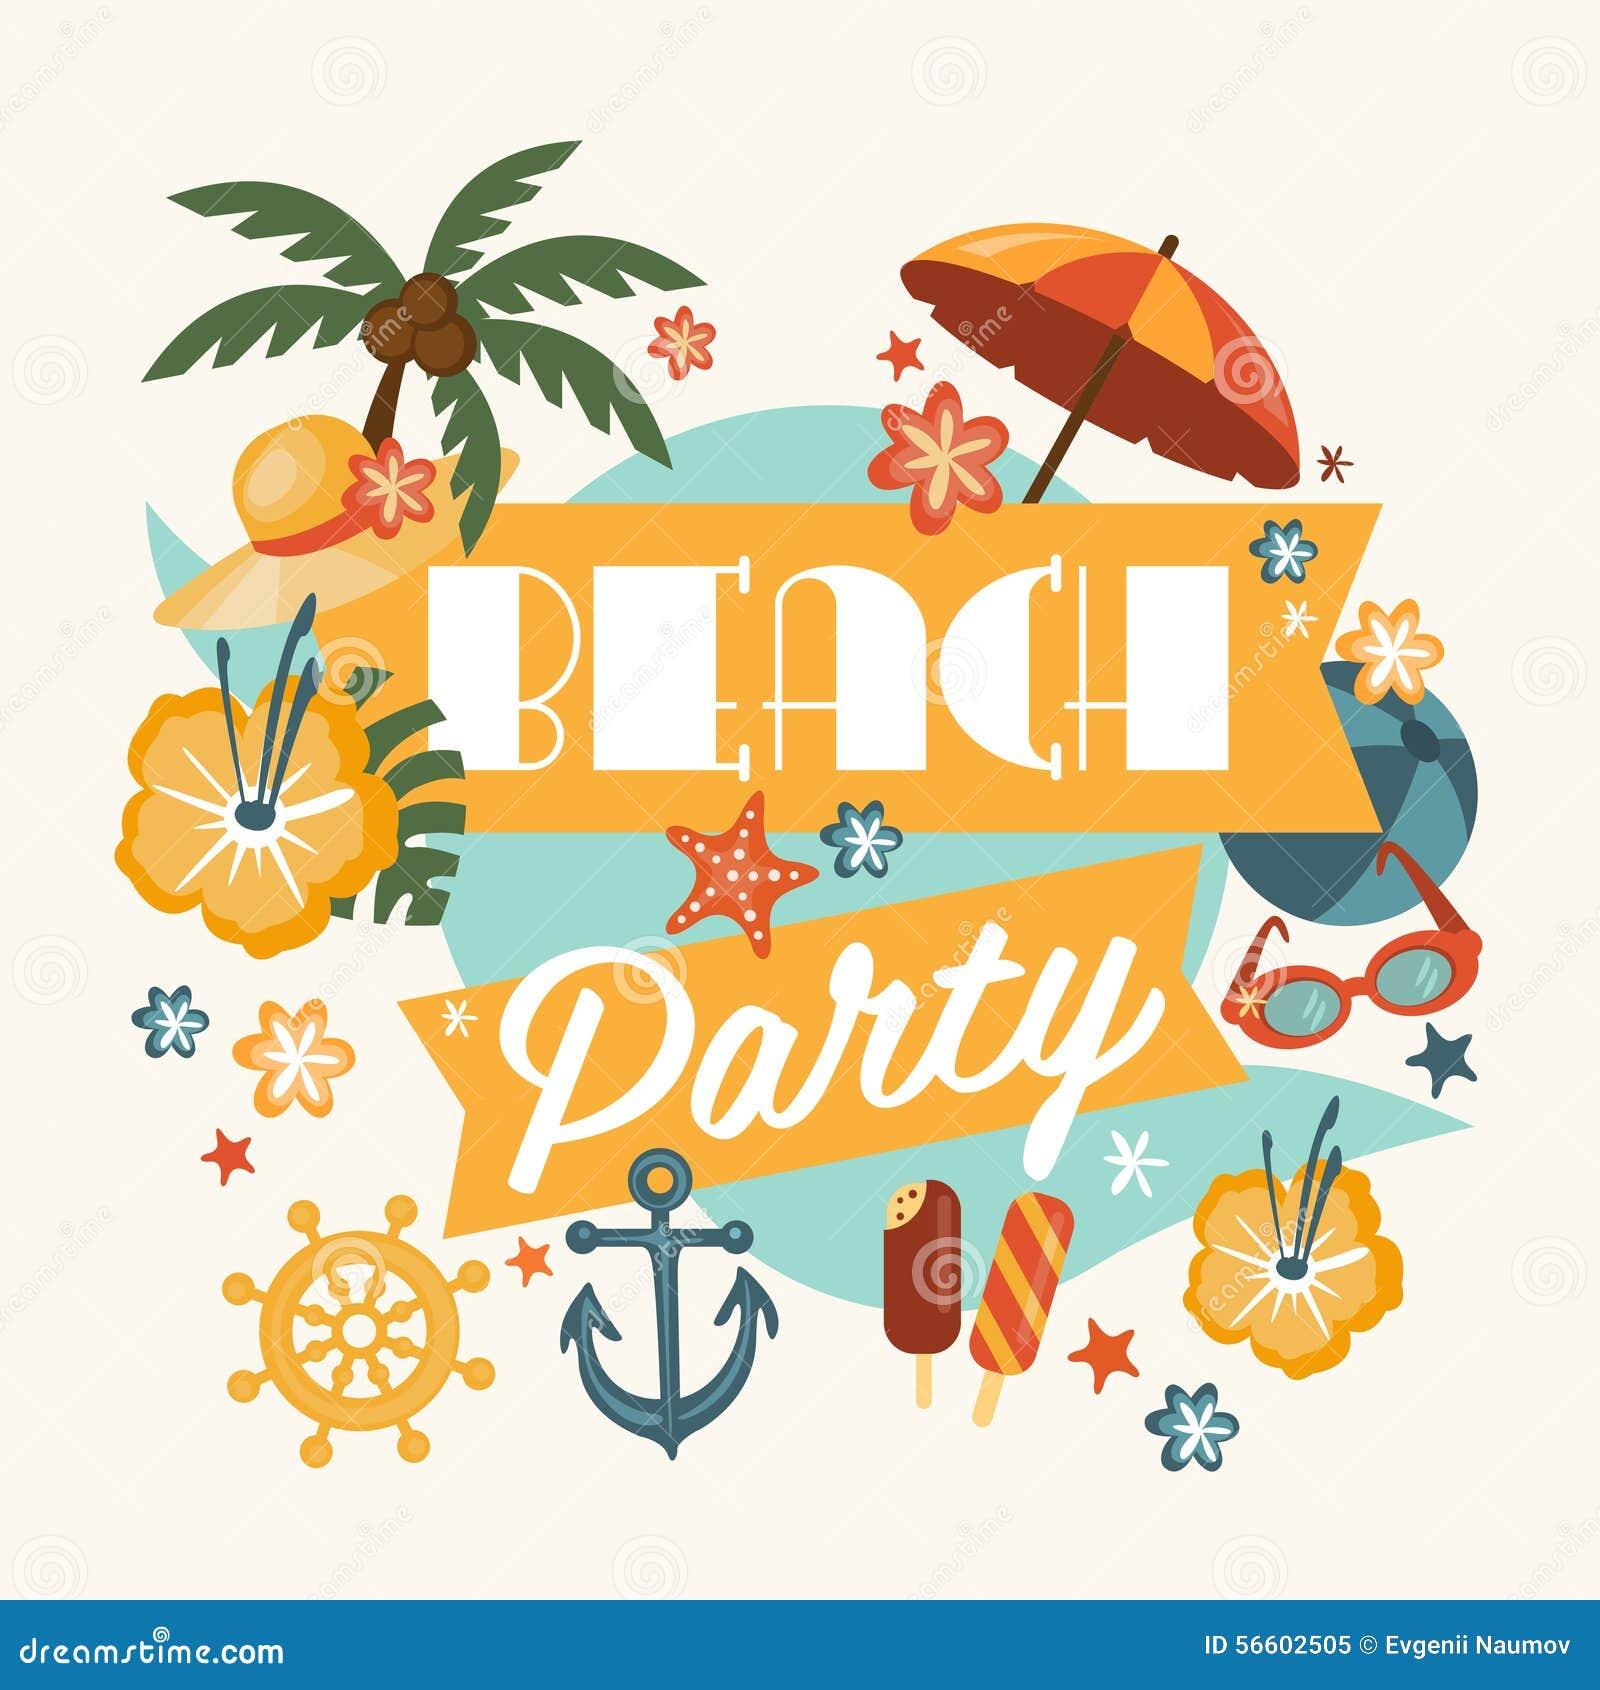 Beautiful Beach Party Design Stock Vector - Image: 56602505